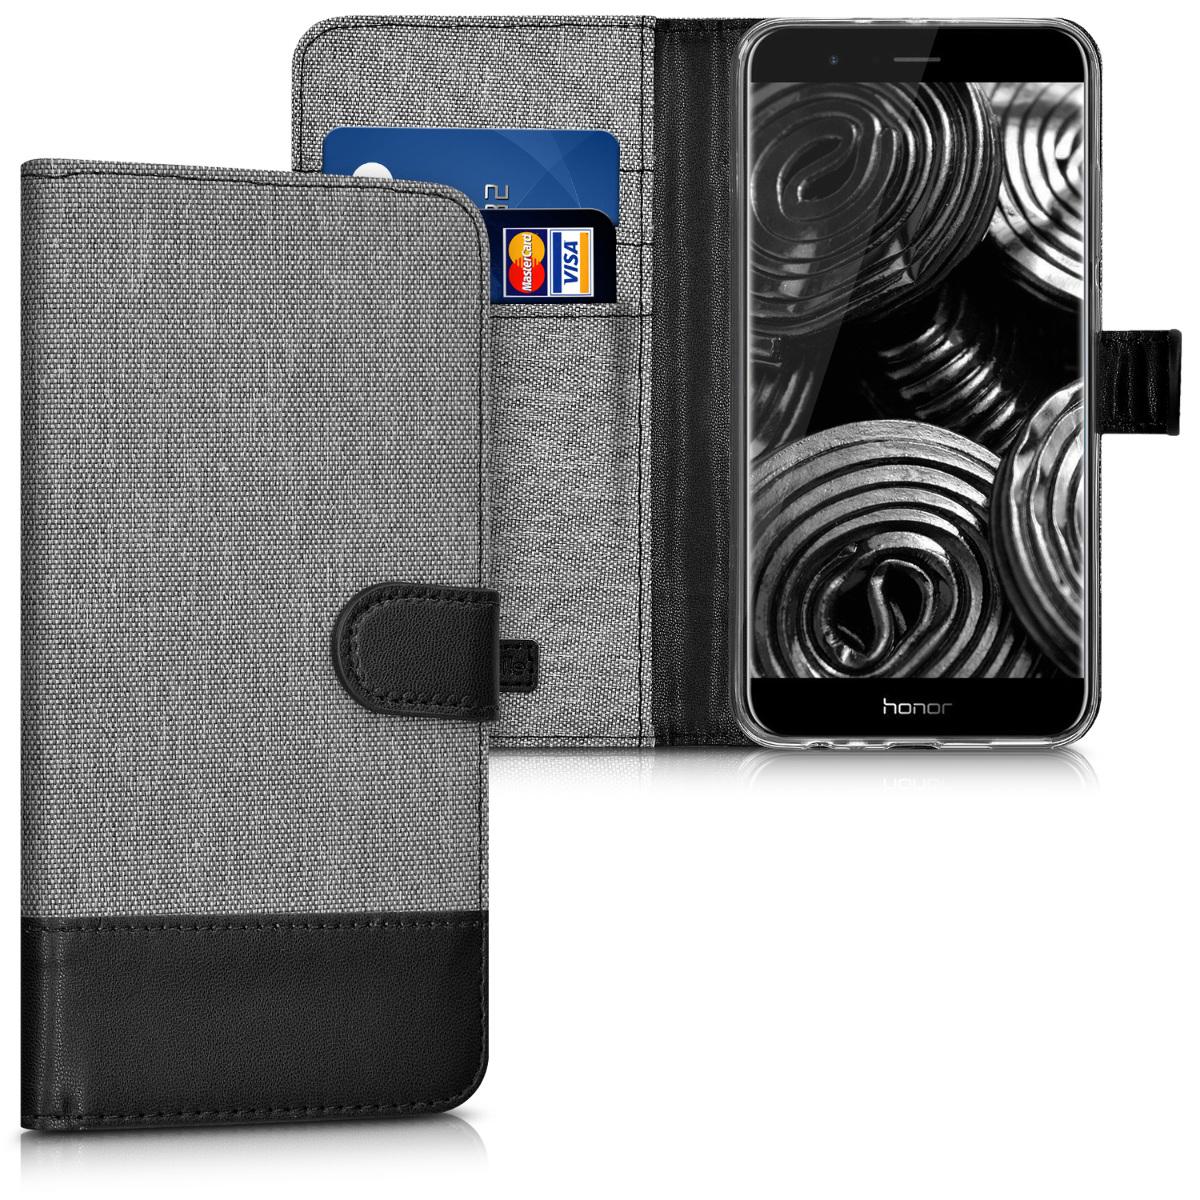 KW Θήκη Πορτοφόλι Huawei Honor 8 Pro - Συνθετικό δέρμα - Grey / Black (41414.01)